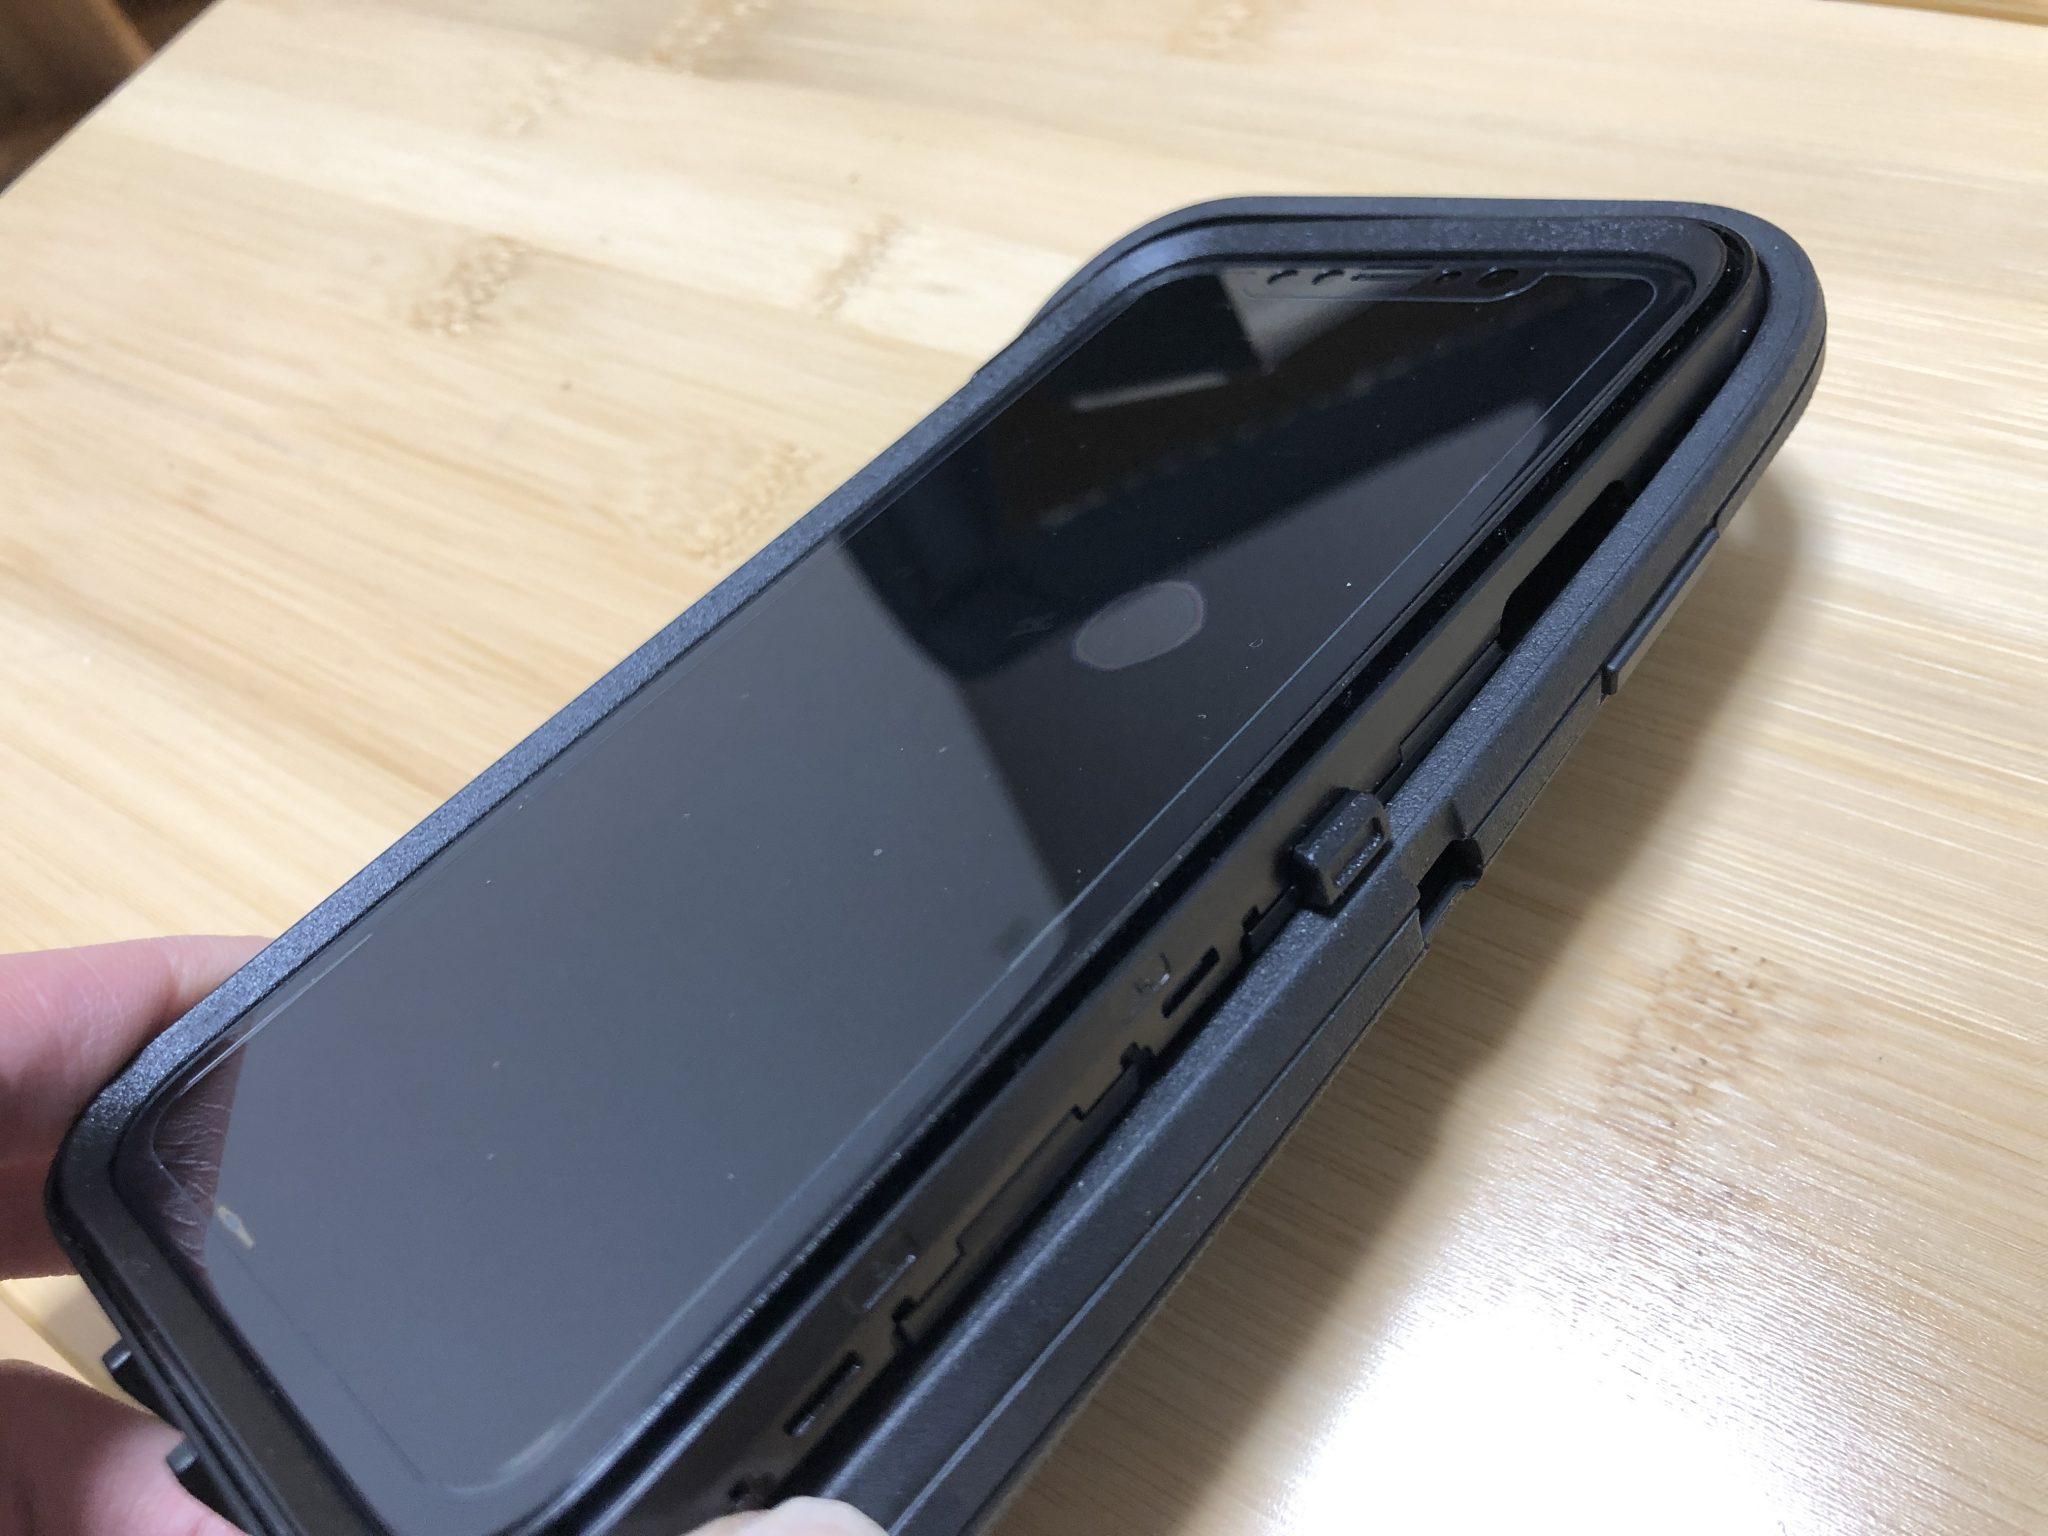 DAF2C9F4 0F1E 4728 8966 1F1B4F77FBAF - サバゲーマーがオススメするOTTER BOX頑丈なiphone11ケースを買ってみた。